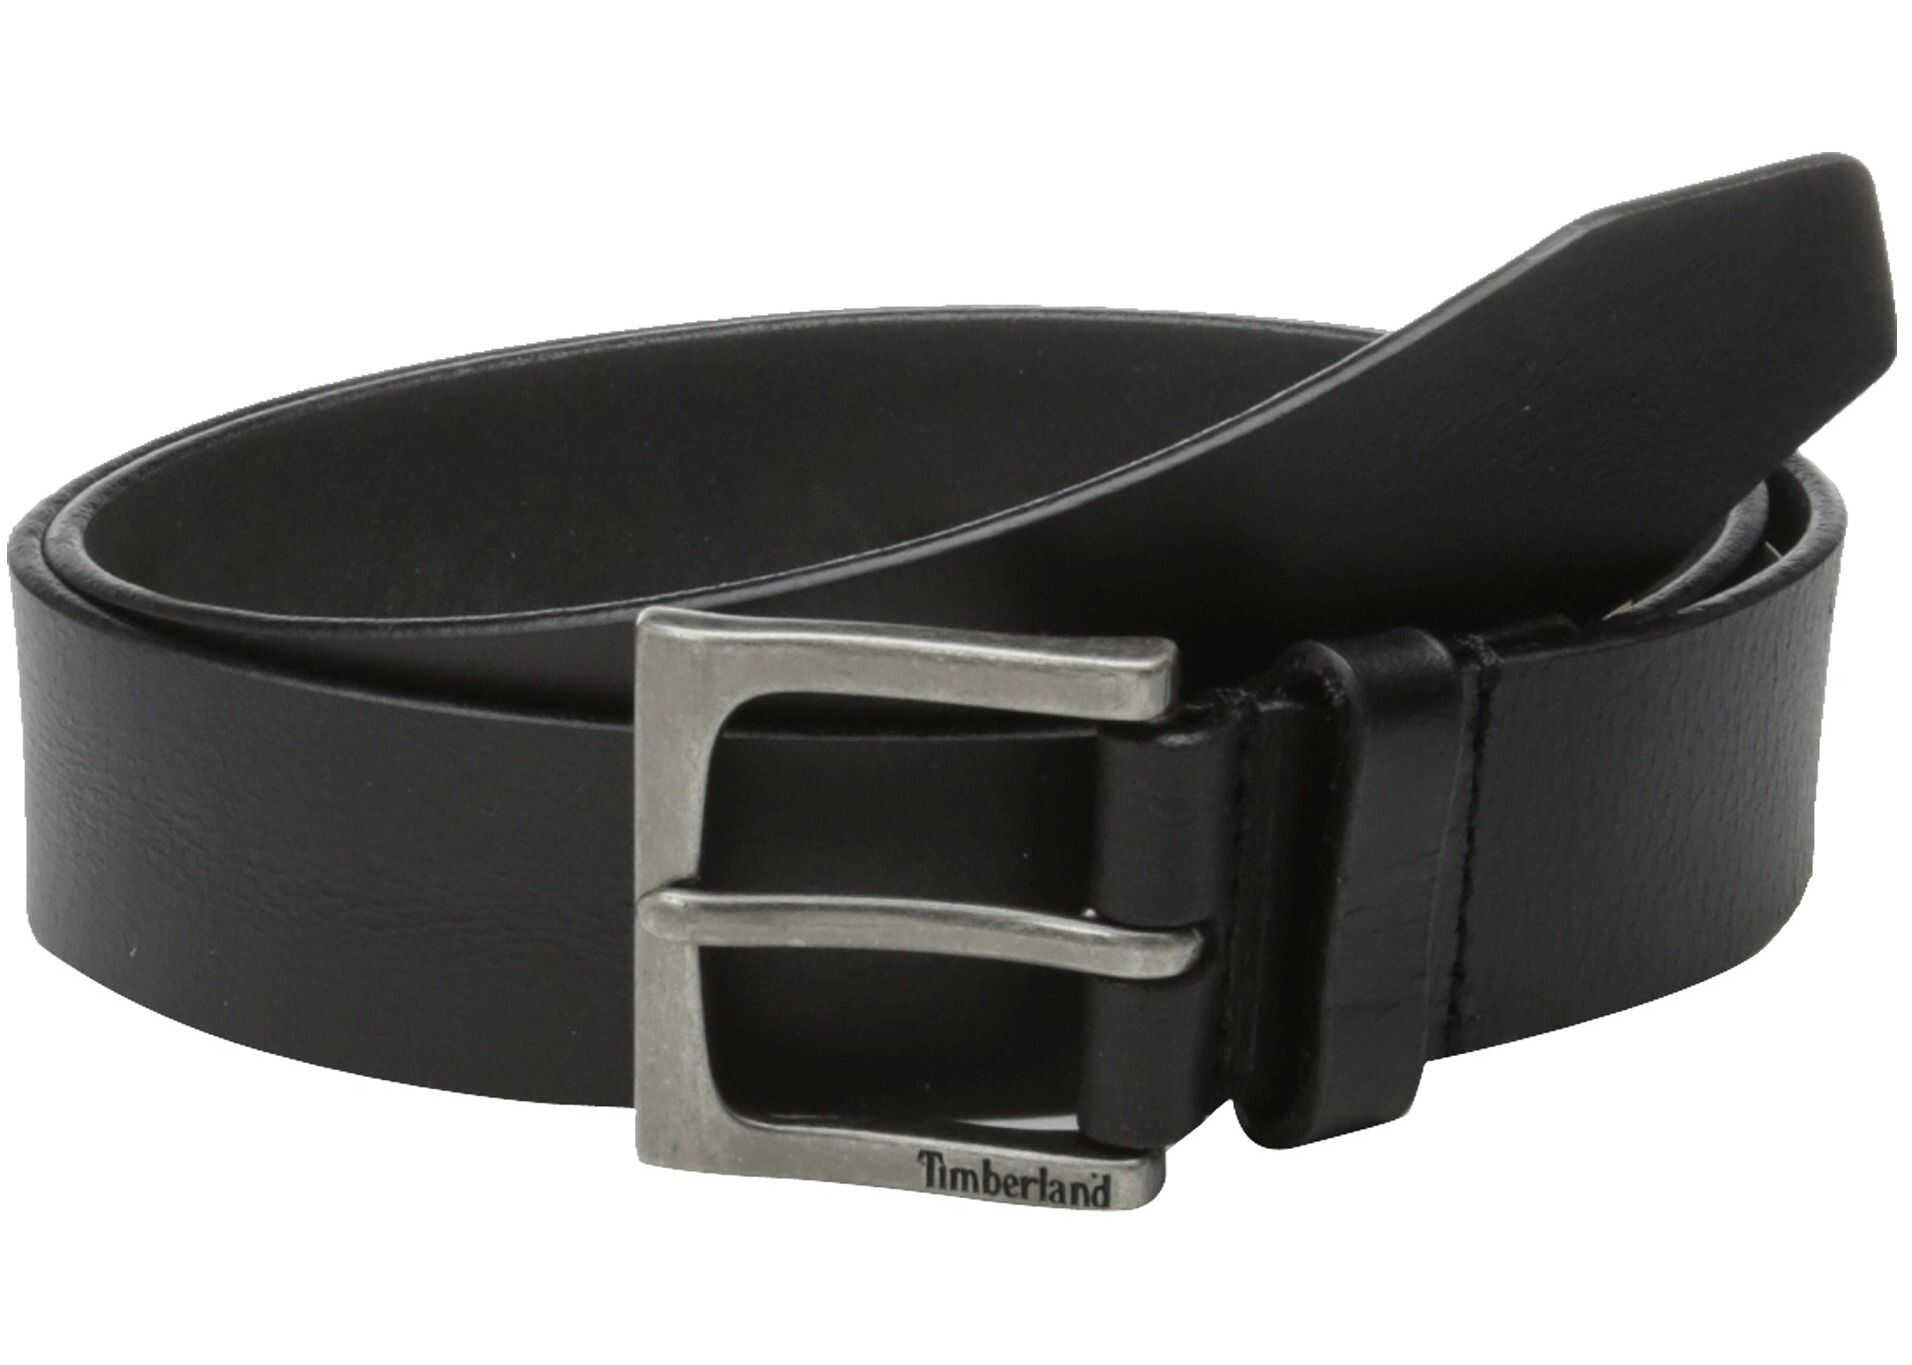 Timberland 35MM Classic Jean Belt Black